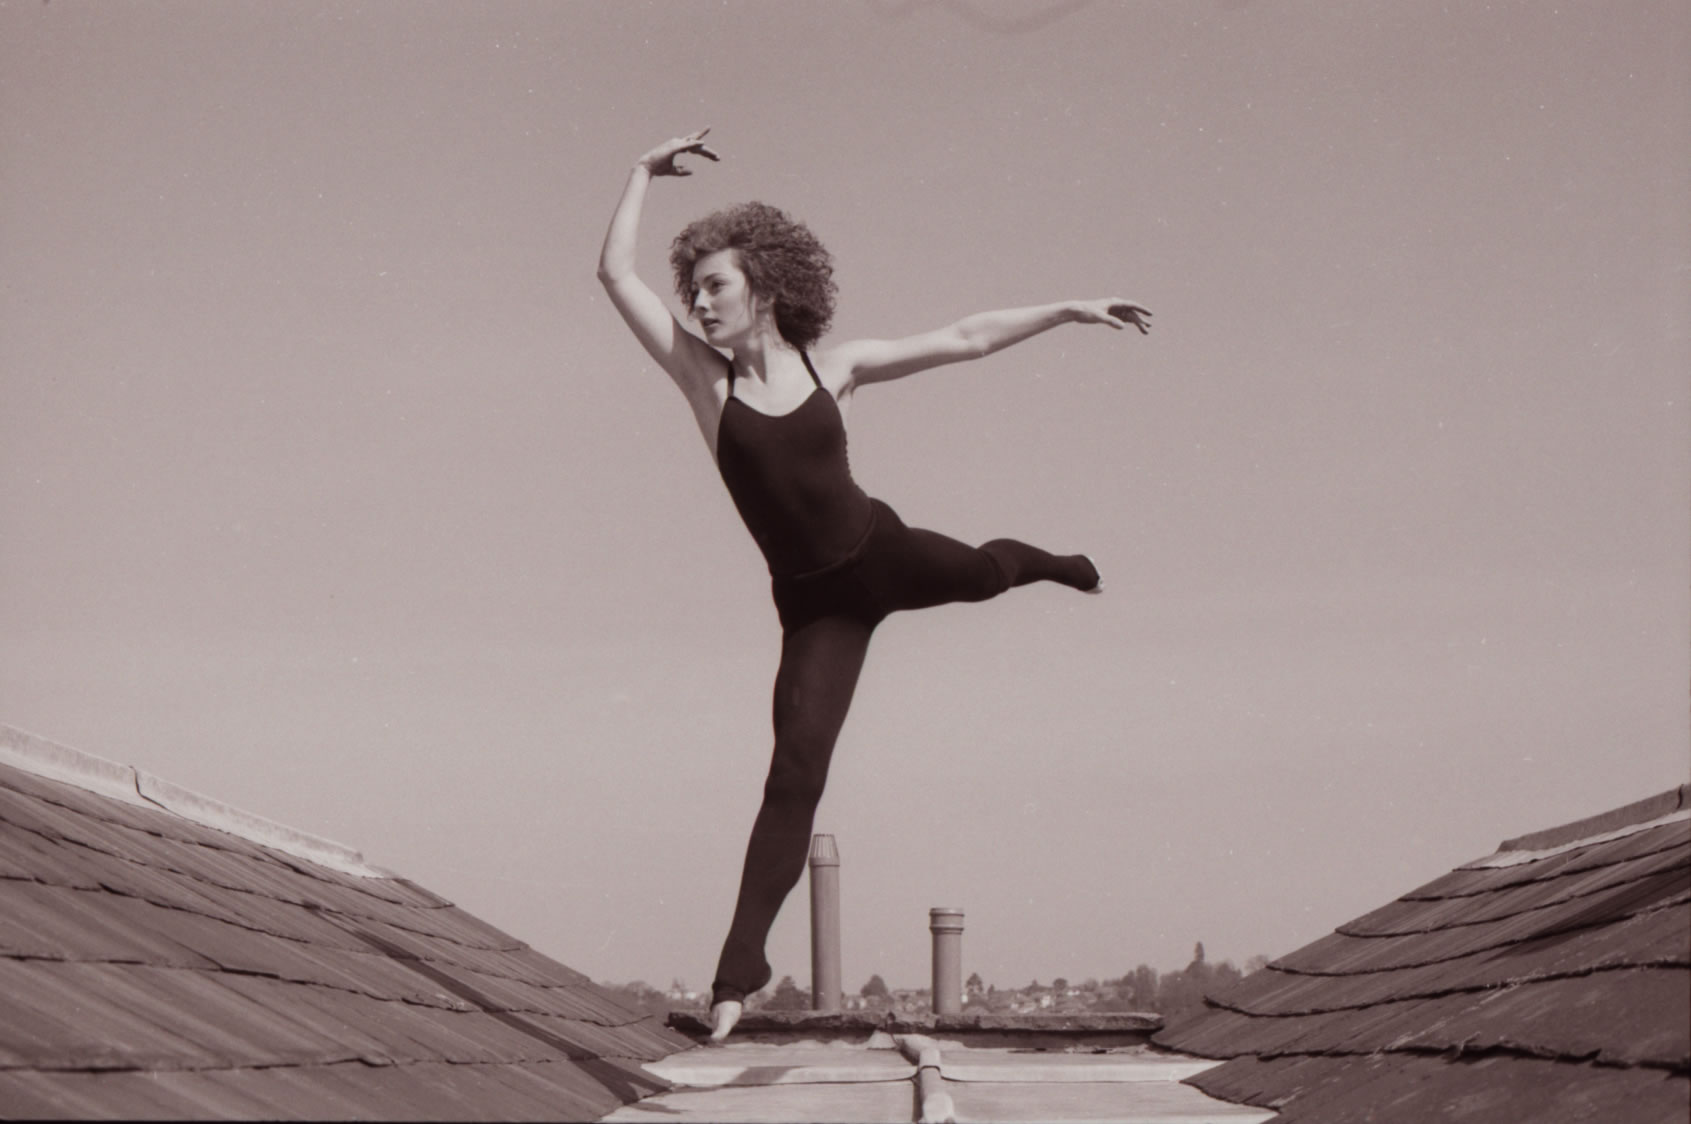 GIRL DANCE ON ROOF